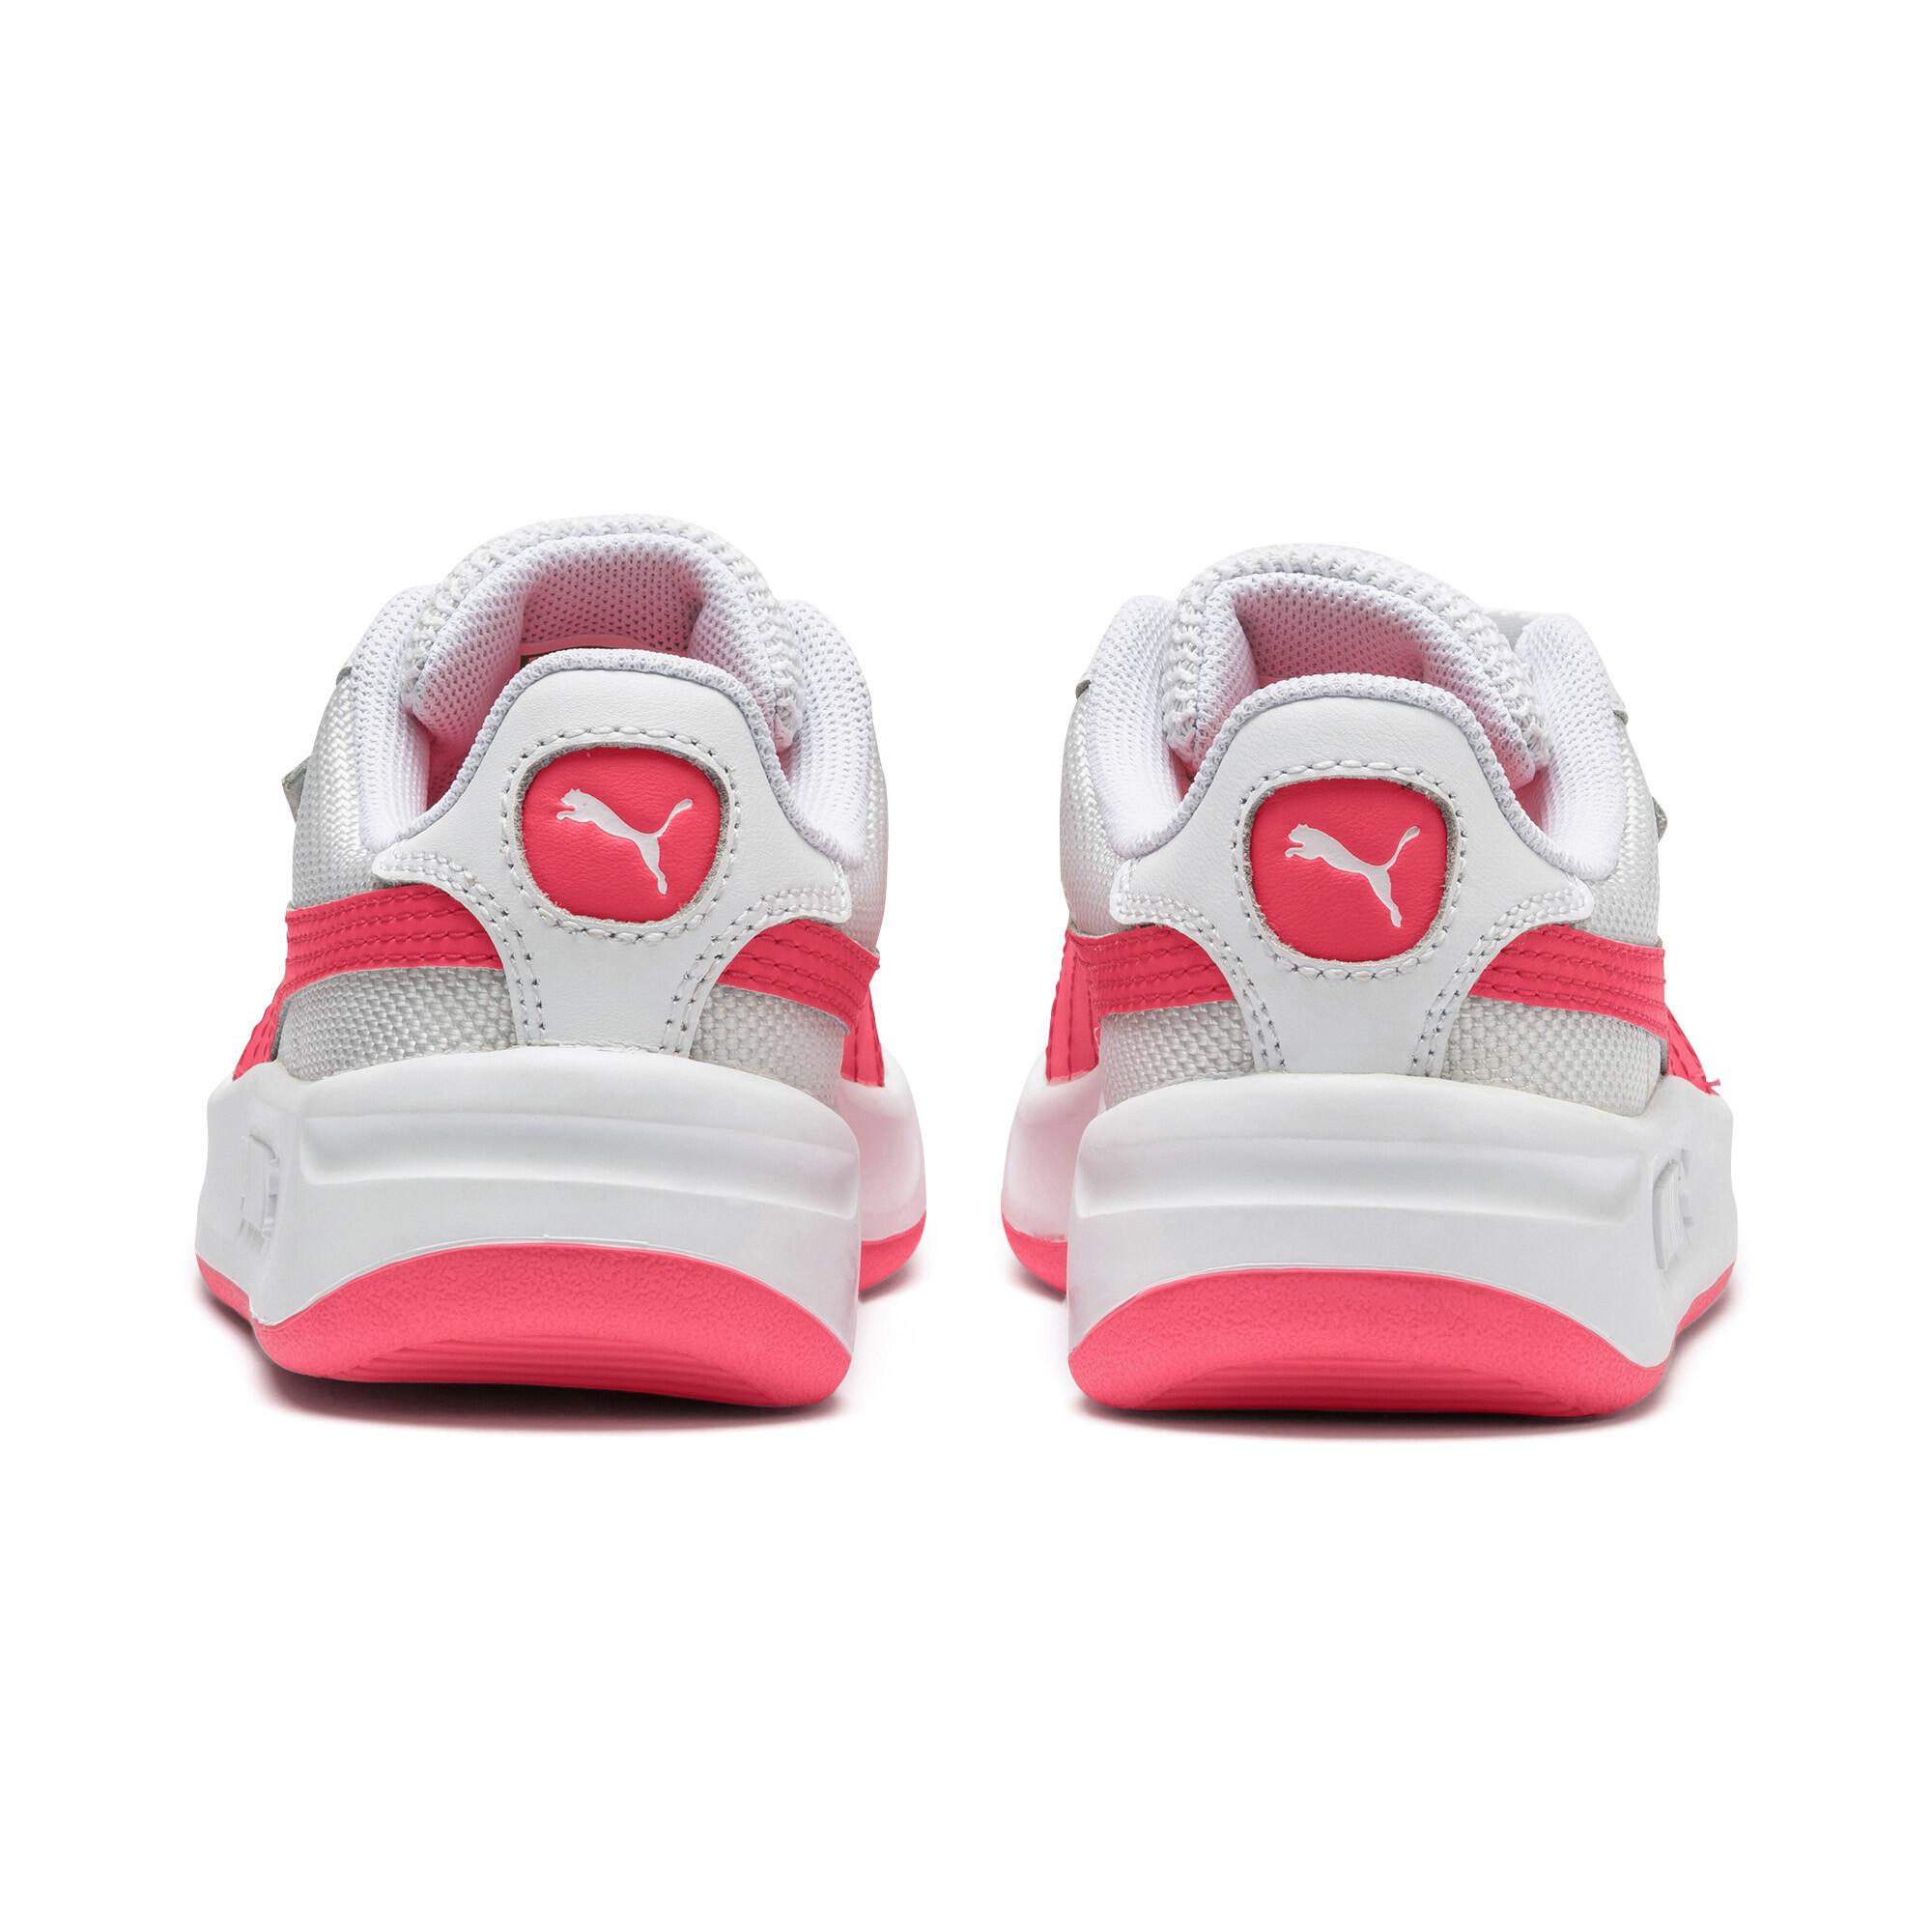 PUMA-California-Little-Kids-039-Shoes-Kids-Shoe-Kids thumbnail 3